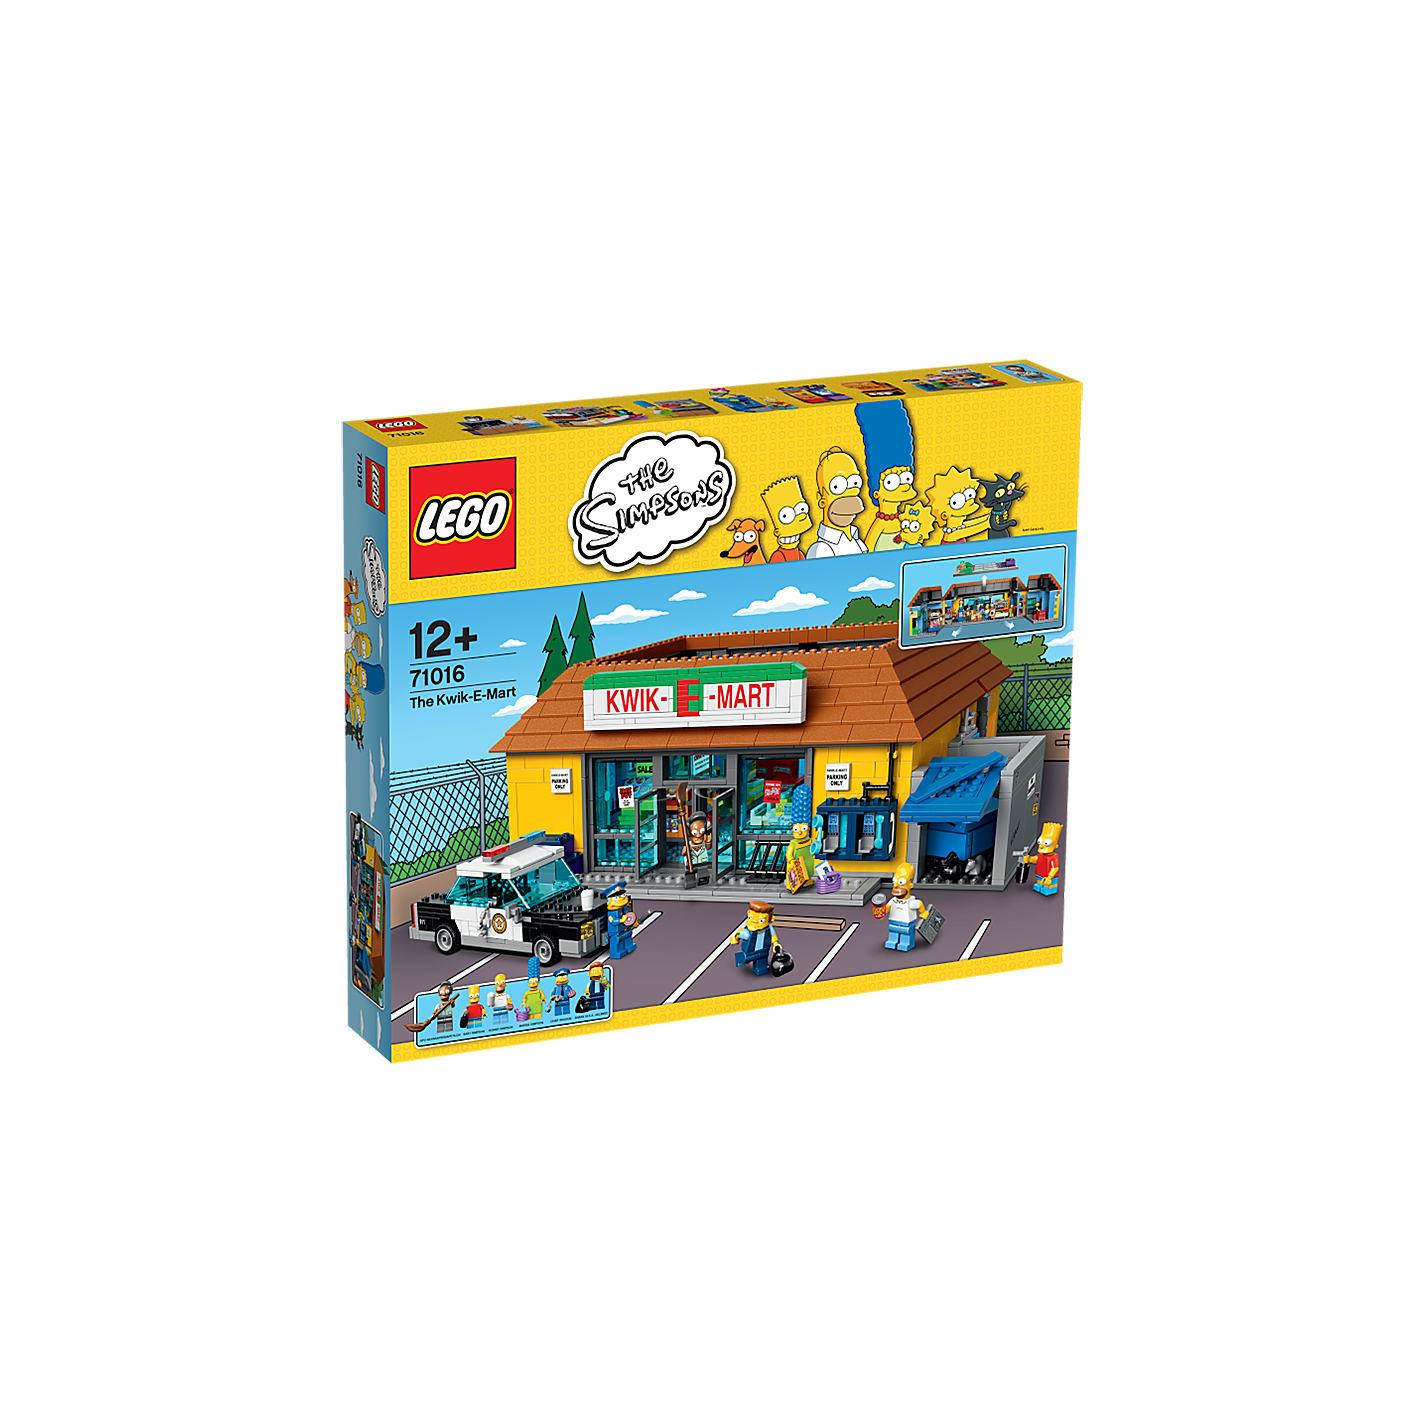 Buy LEGO The Simpsons       Kwik E Mart Online at johnlewis com     John Lewis